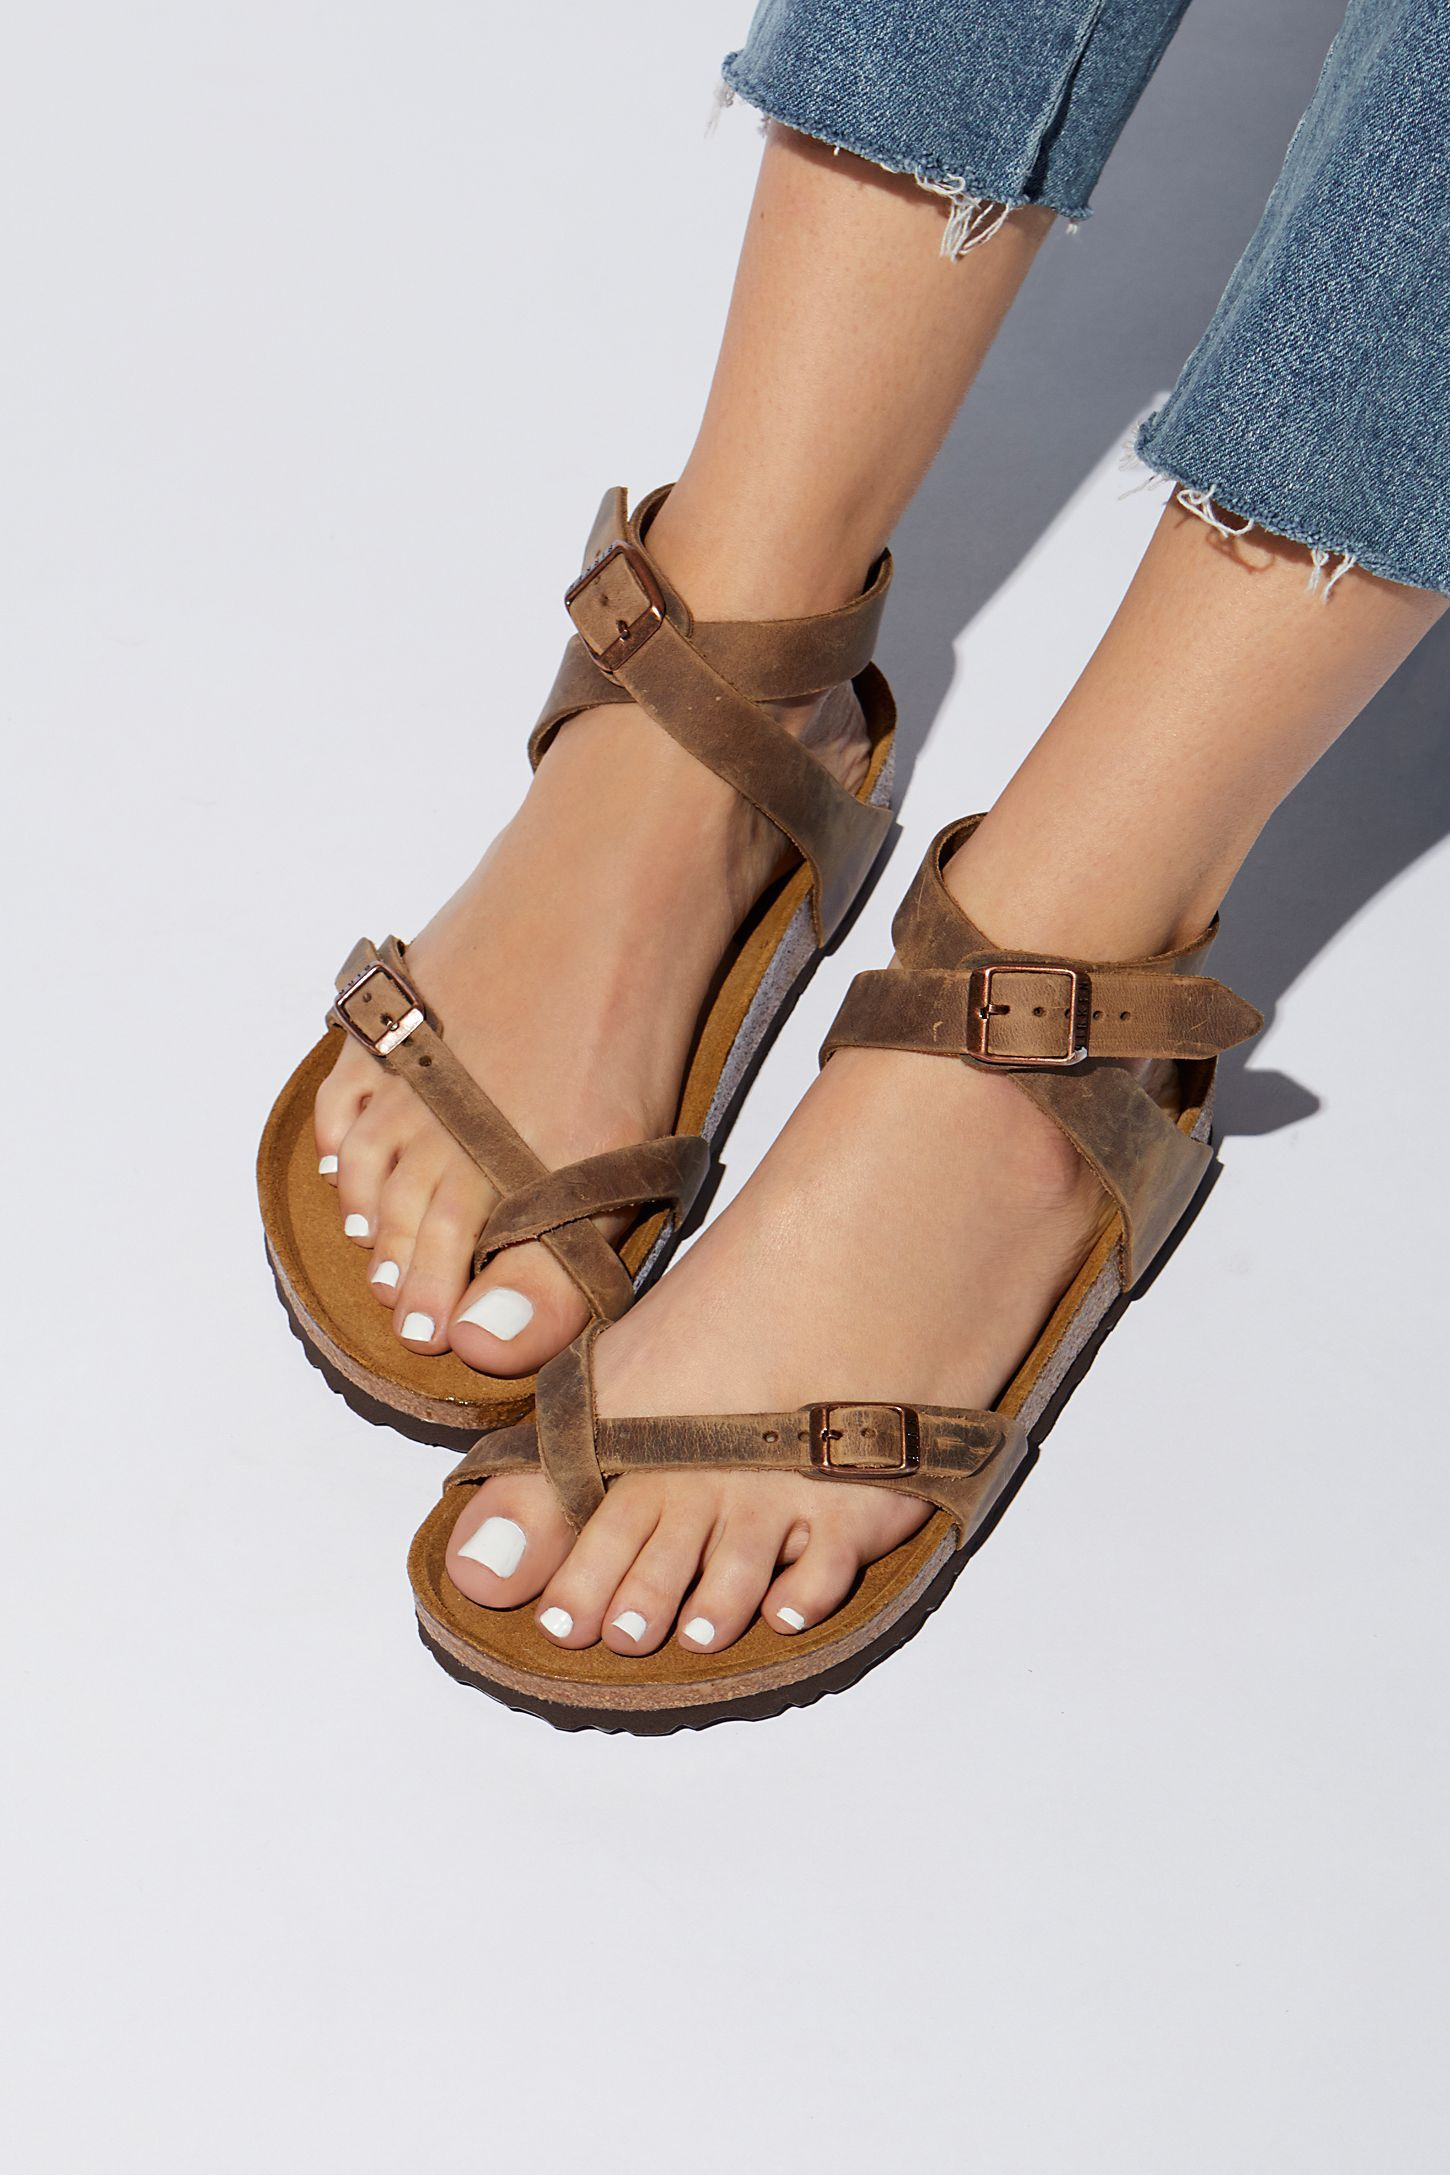 3e9de8ba3 Yara Birkenstock Sandal   Comfortable, Stylish Shoes   Zapatos ...